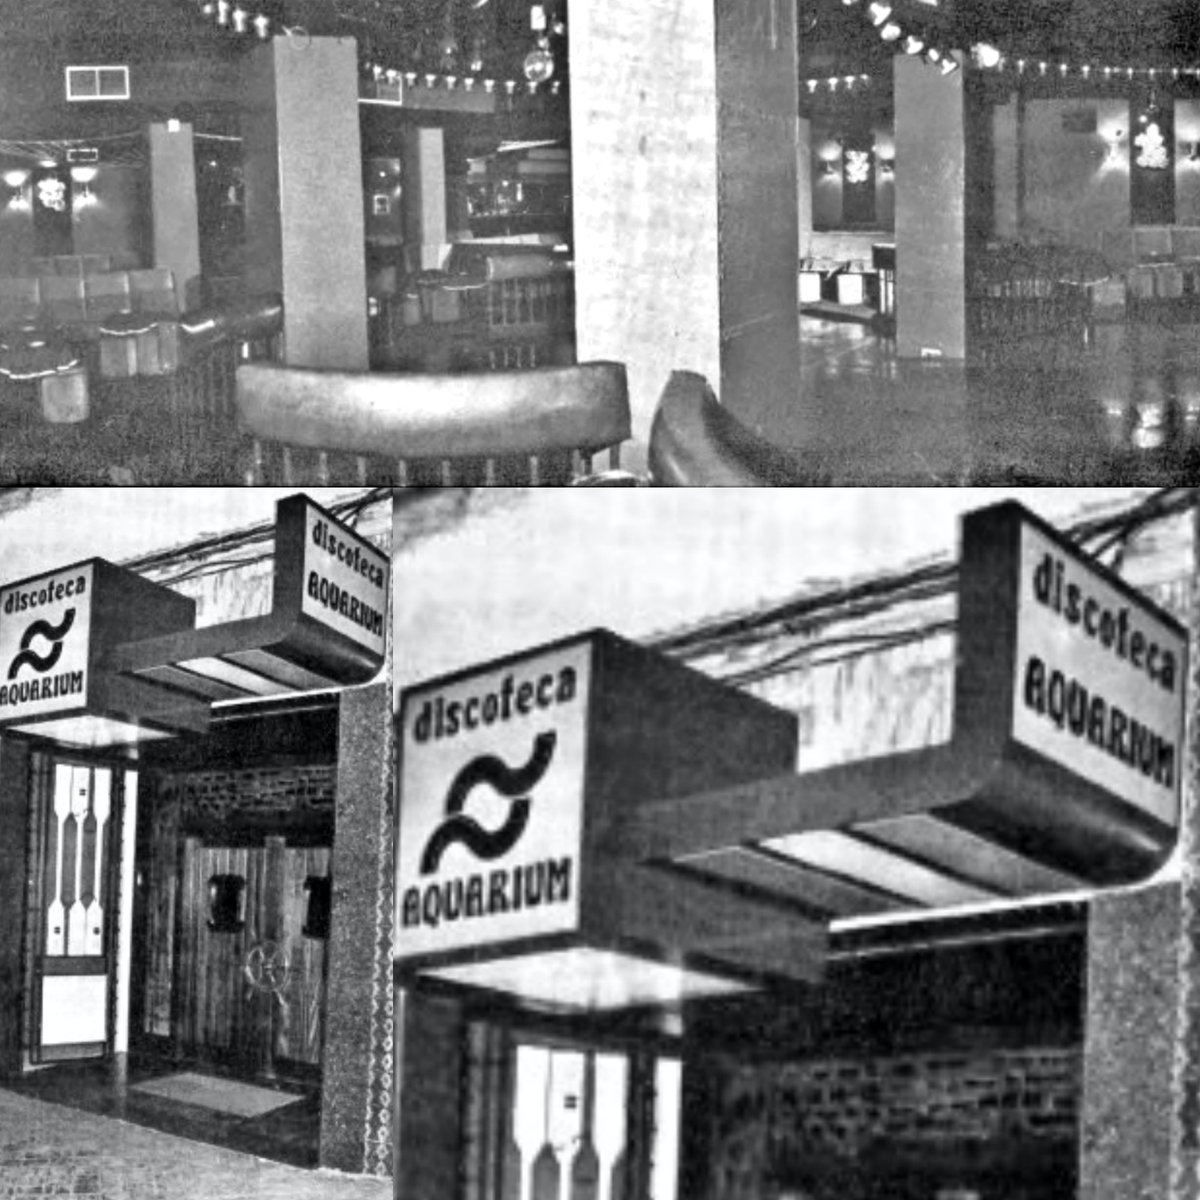 ¡Buenos días#Alcorcón! Así fue la inauguración de la discoteca Aquarium en 1978. Pongamos que hablo de Alcorcón. Soy de https://t.co/O5CuDMRoZi #AlcorcónAntiguo #MeGustaAlcorcón #foto #fotografía #photo #alcorconhoy https://t.co/HolloG9tiM